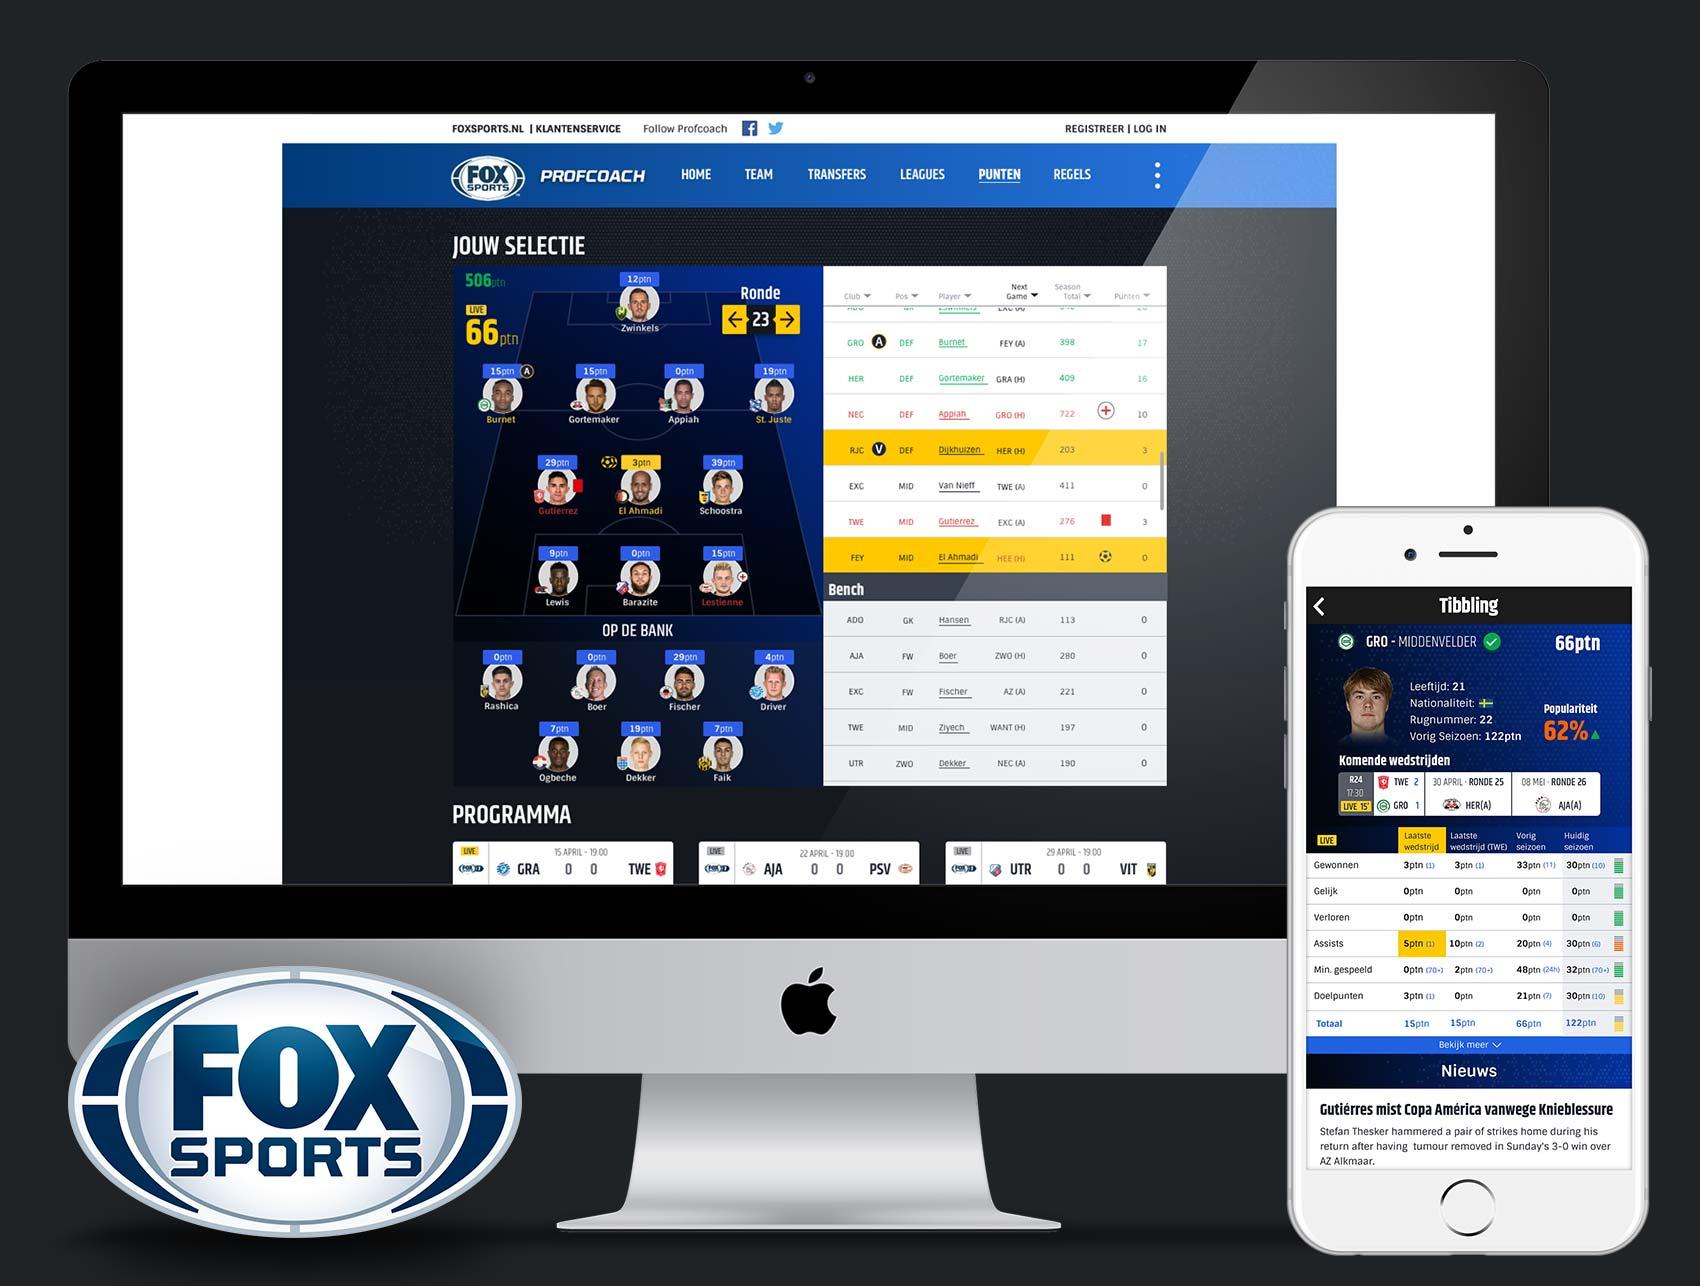 Fox Sports: Profcoach, Eredivisie Fantasy Football Game